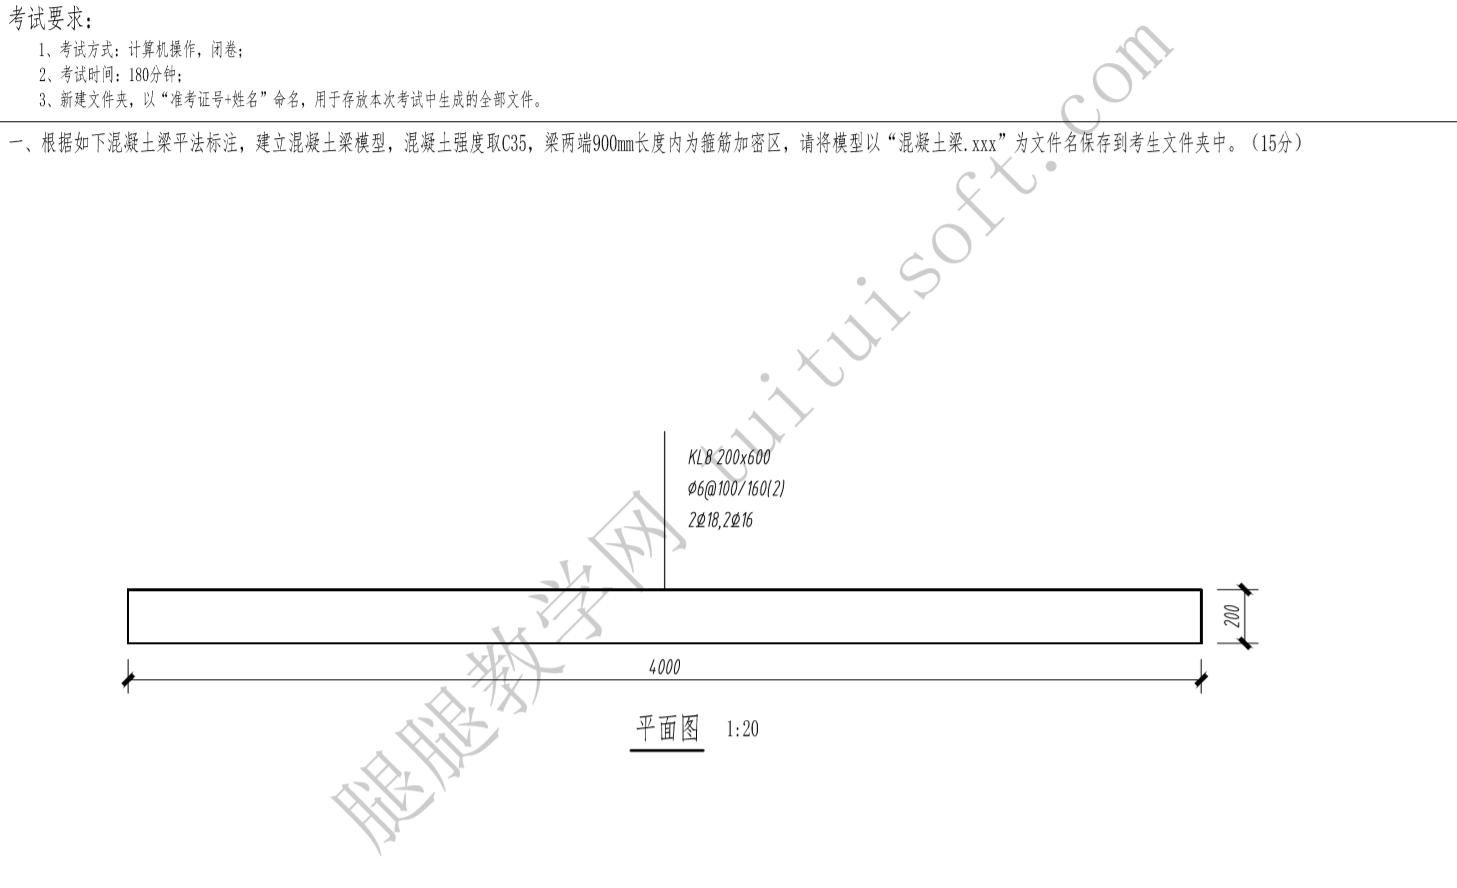 https://mubu.com/document_image/3fb6a483-7923-4520-8d70-c698ba3866fb-3841000.jpg